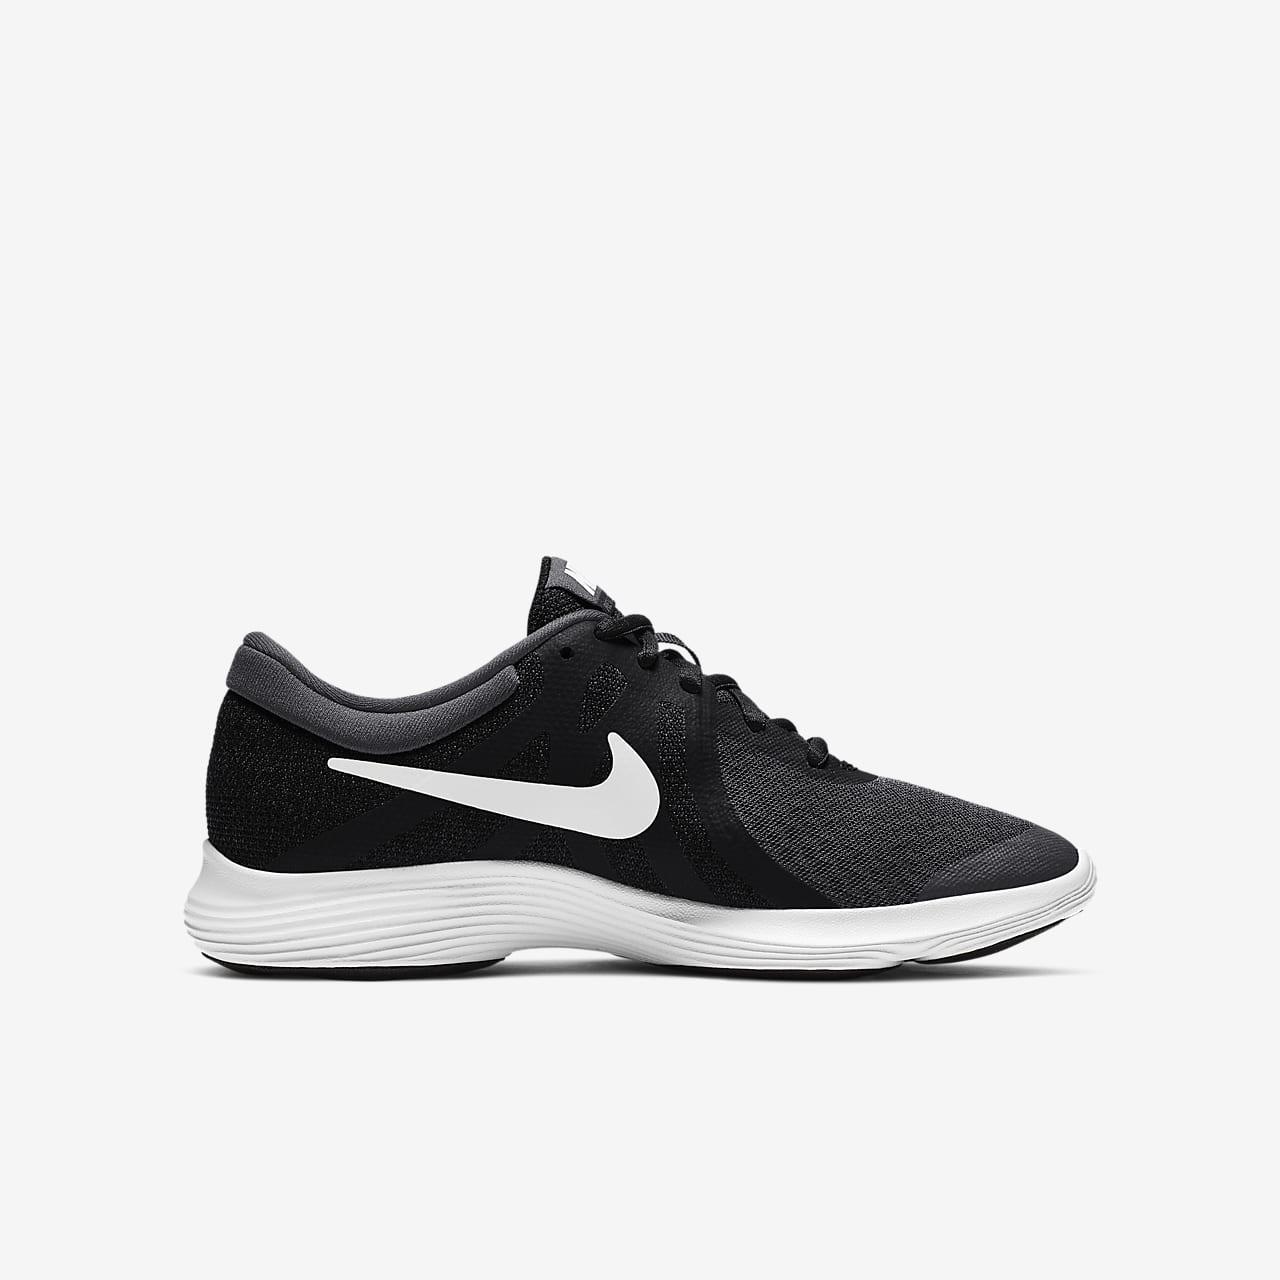 658cda9f337538 Nike Revolution 4 Big Kids  Running Shoe. Nike.com